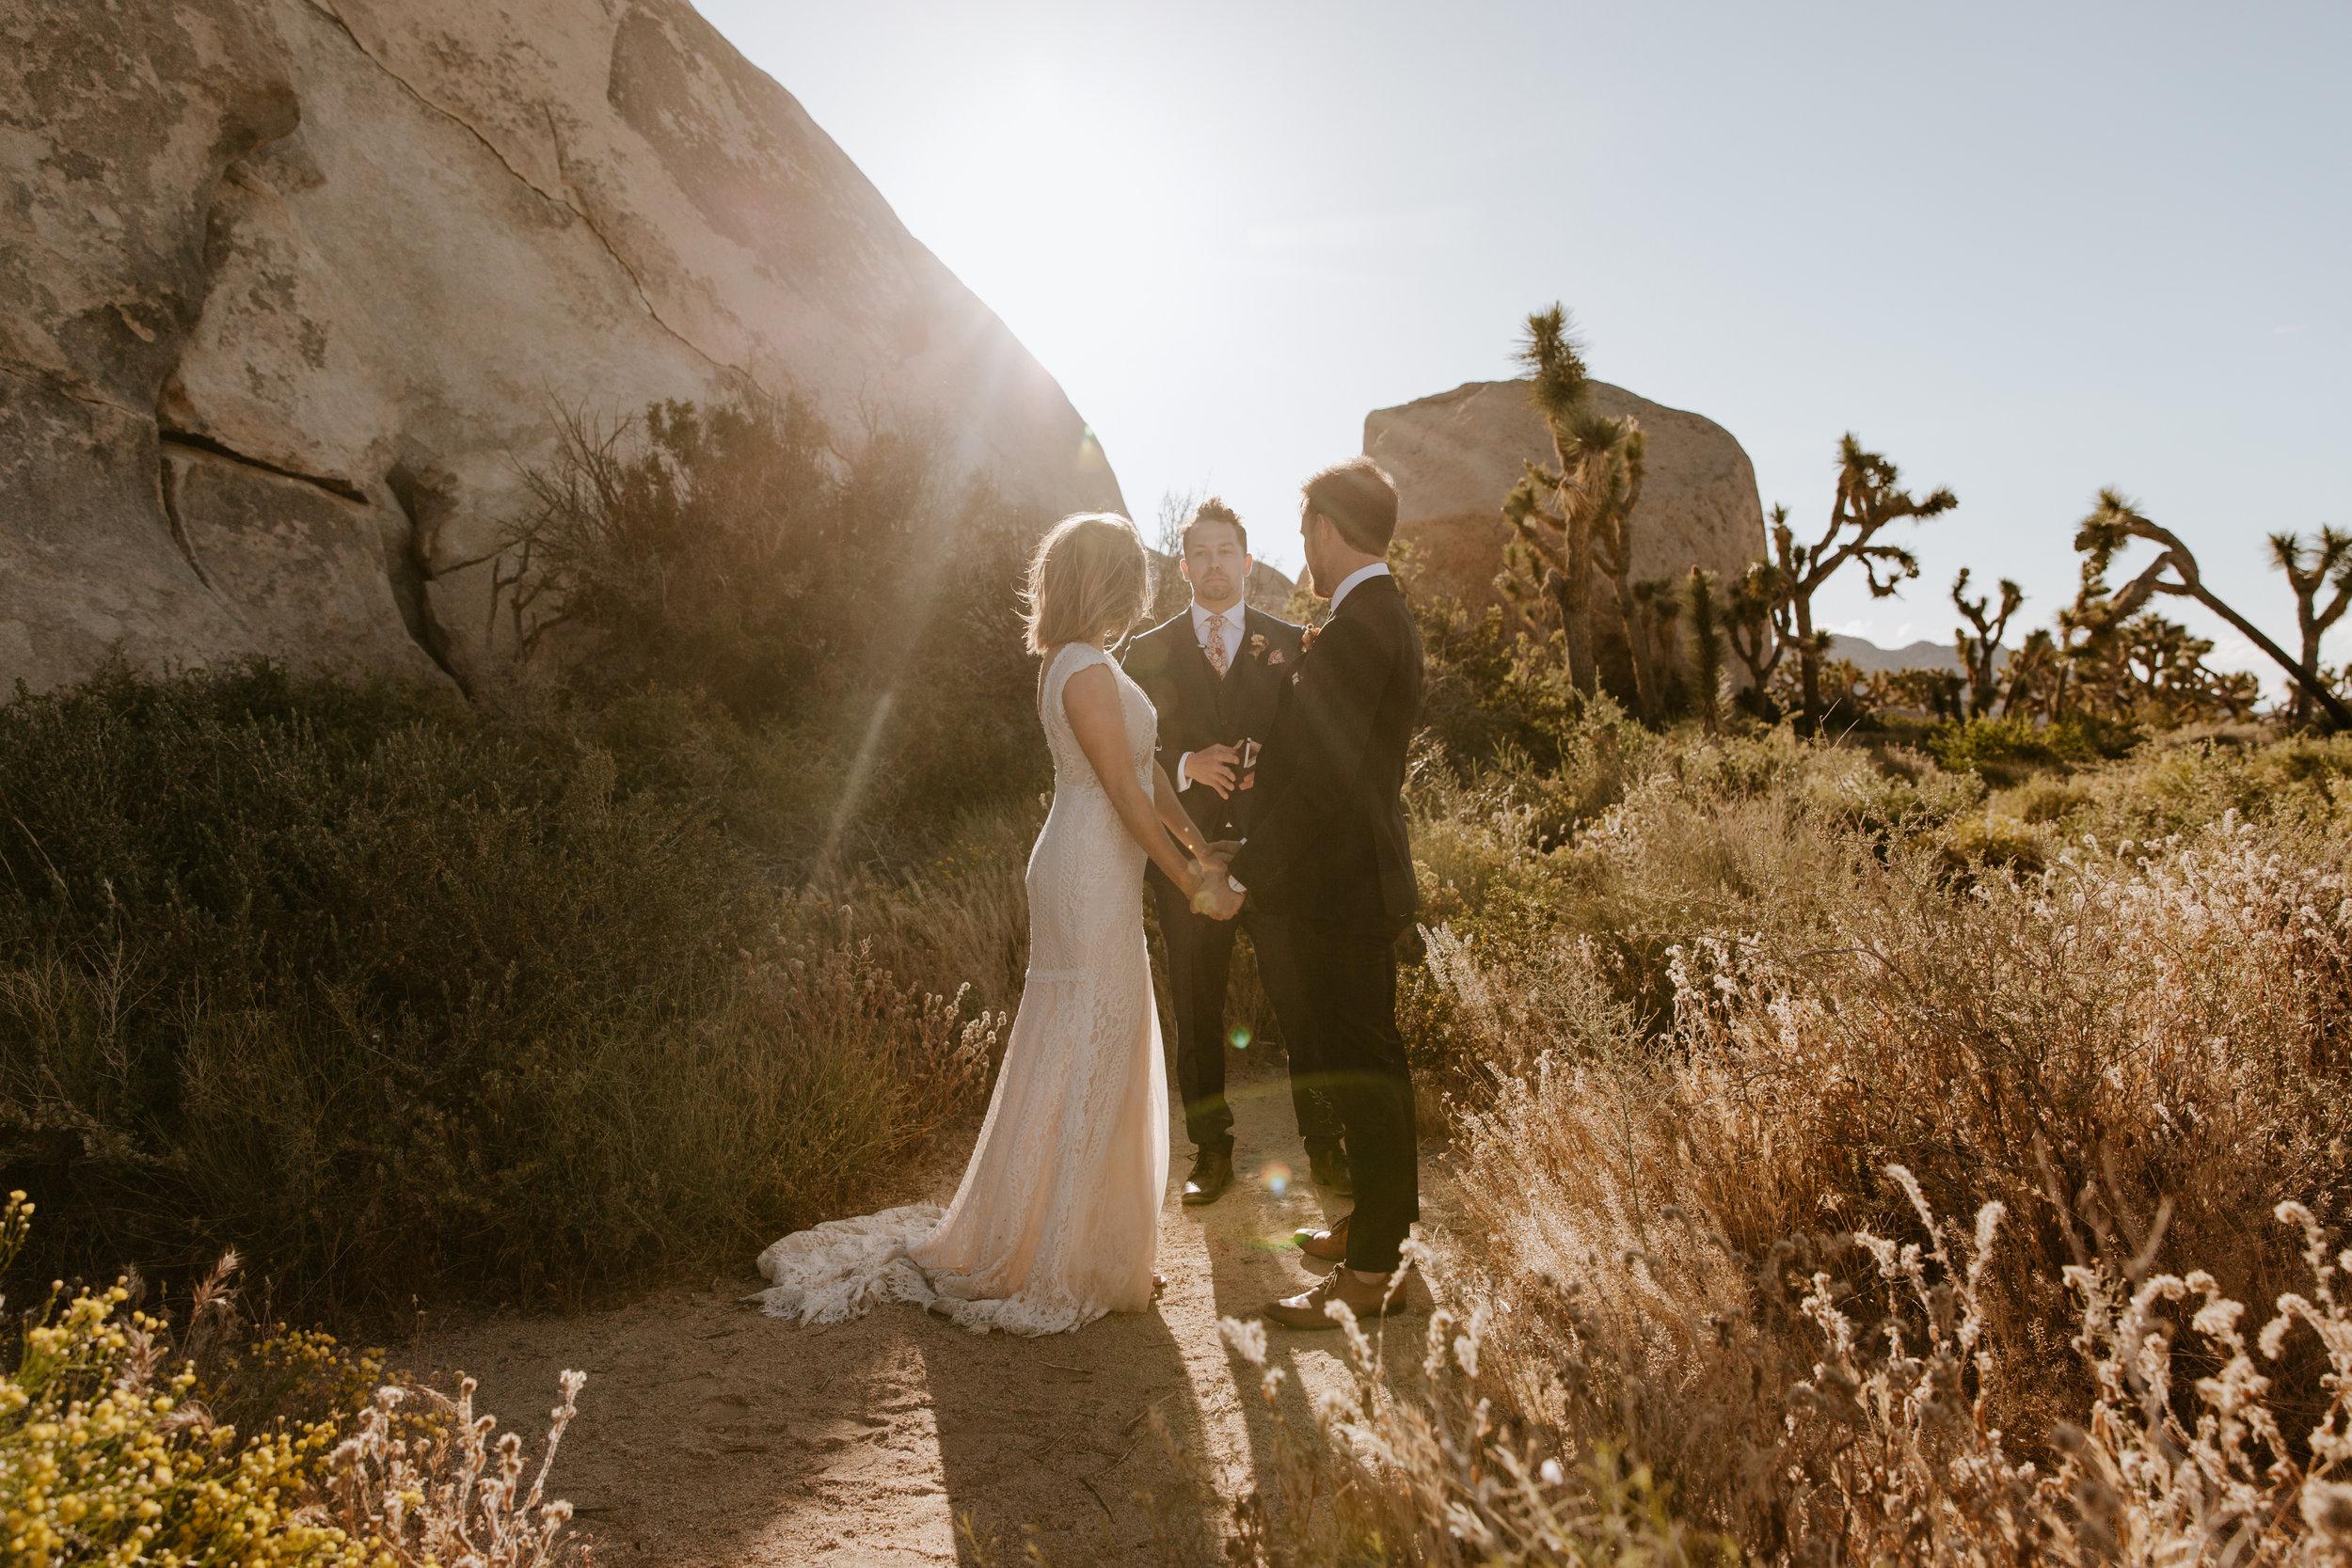 2019-05-26_Callie-Evan_Wedding_Joshua Tree_Paige Nelson_PREVIEWS HR-47.jpg